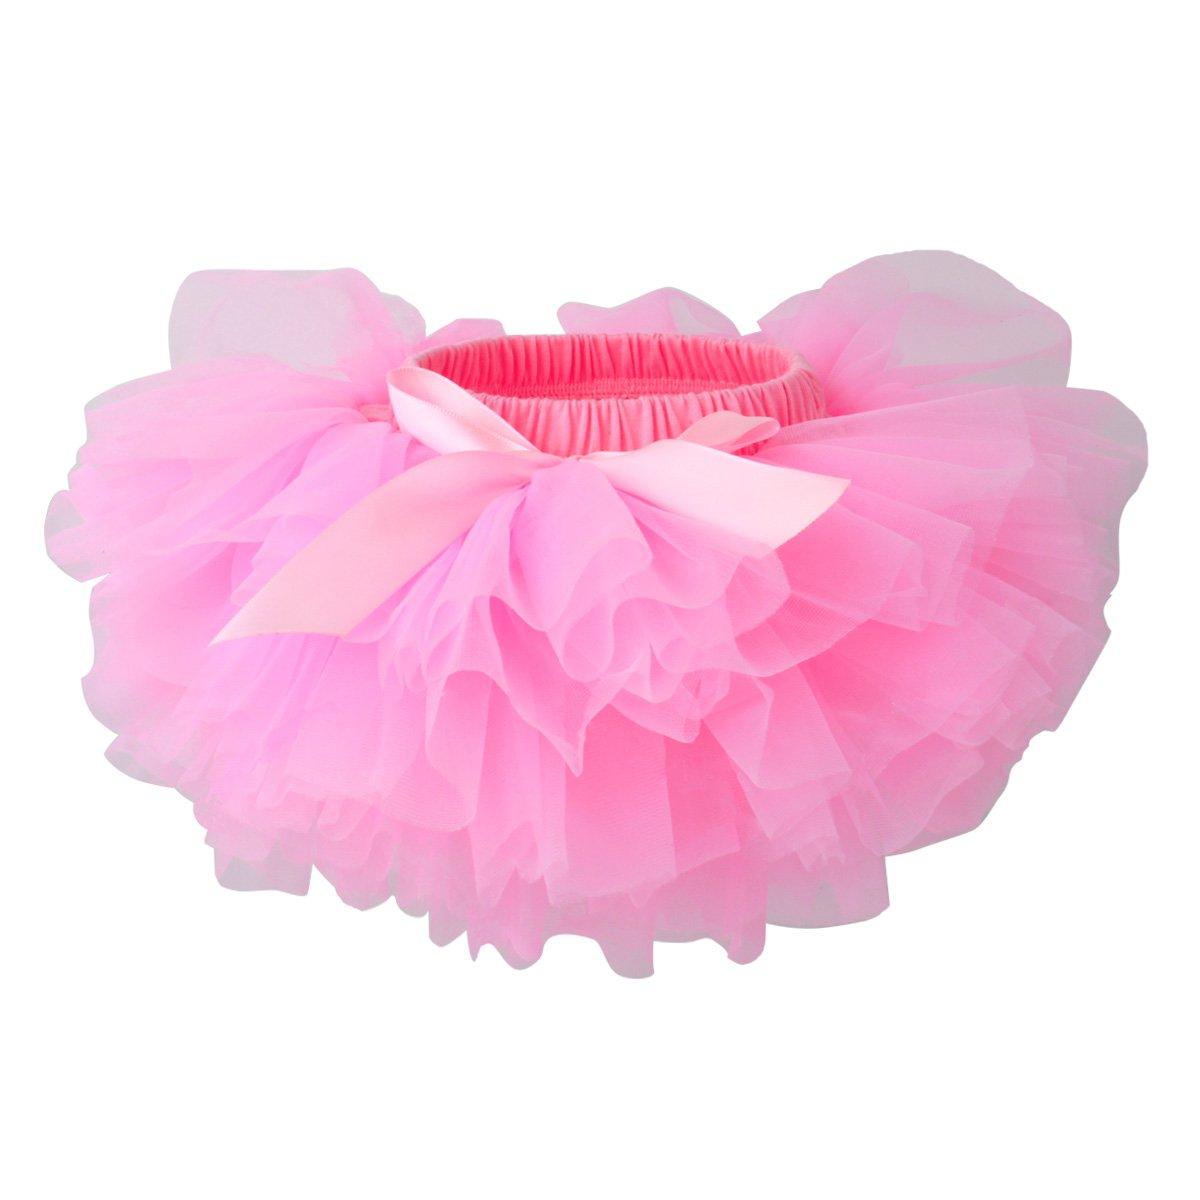 Slowera Baby Girls Soft Tutu Skirt (Skorts) 0 to 36 Months (M: 6-12 Months, Pink) by Slowera